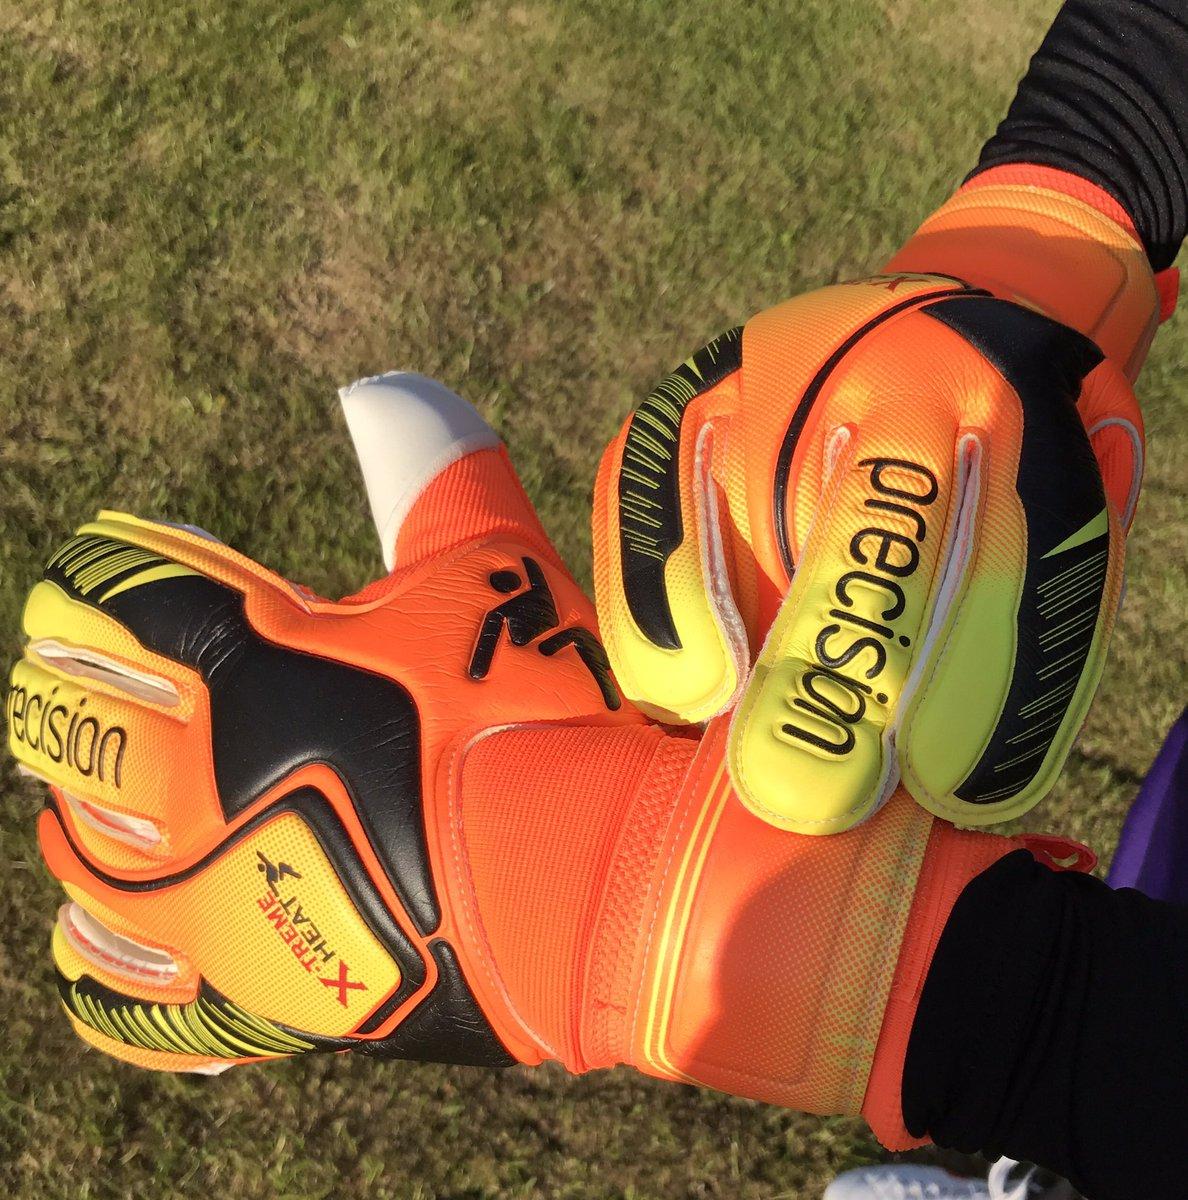 Mens gloves sports direct - Adidas Ace Zones Pro Gk Gloves Solar Green Core Black Shock Pink Pro Direct Soccer Goalkeeper Mens